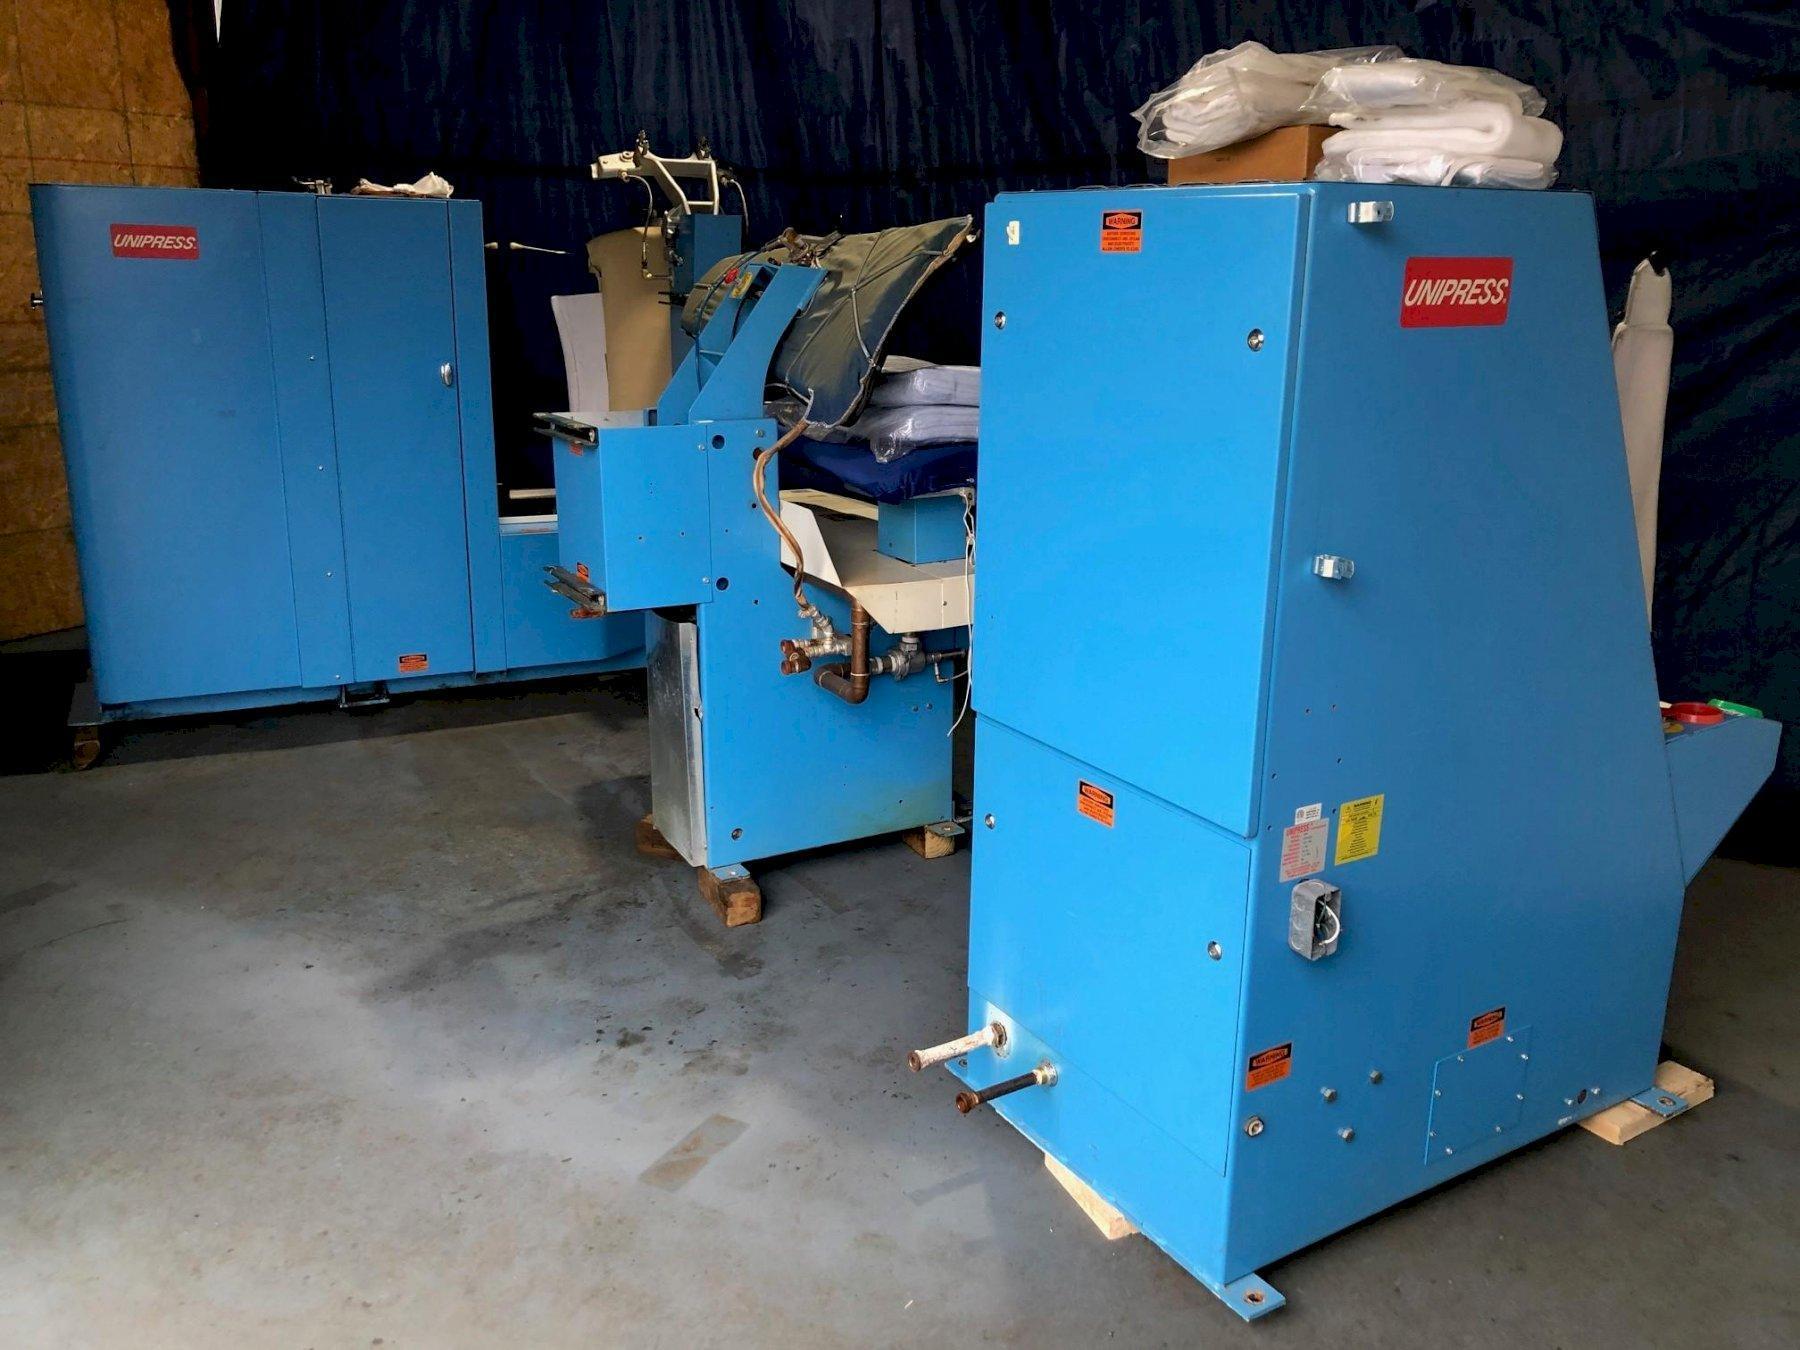 Unipress Steam Press Line Body / Sheever / Legger